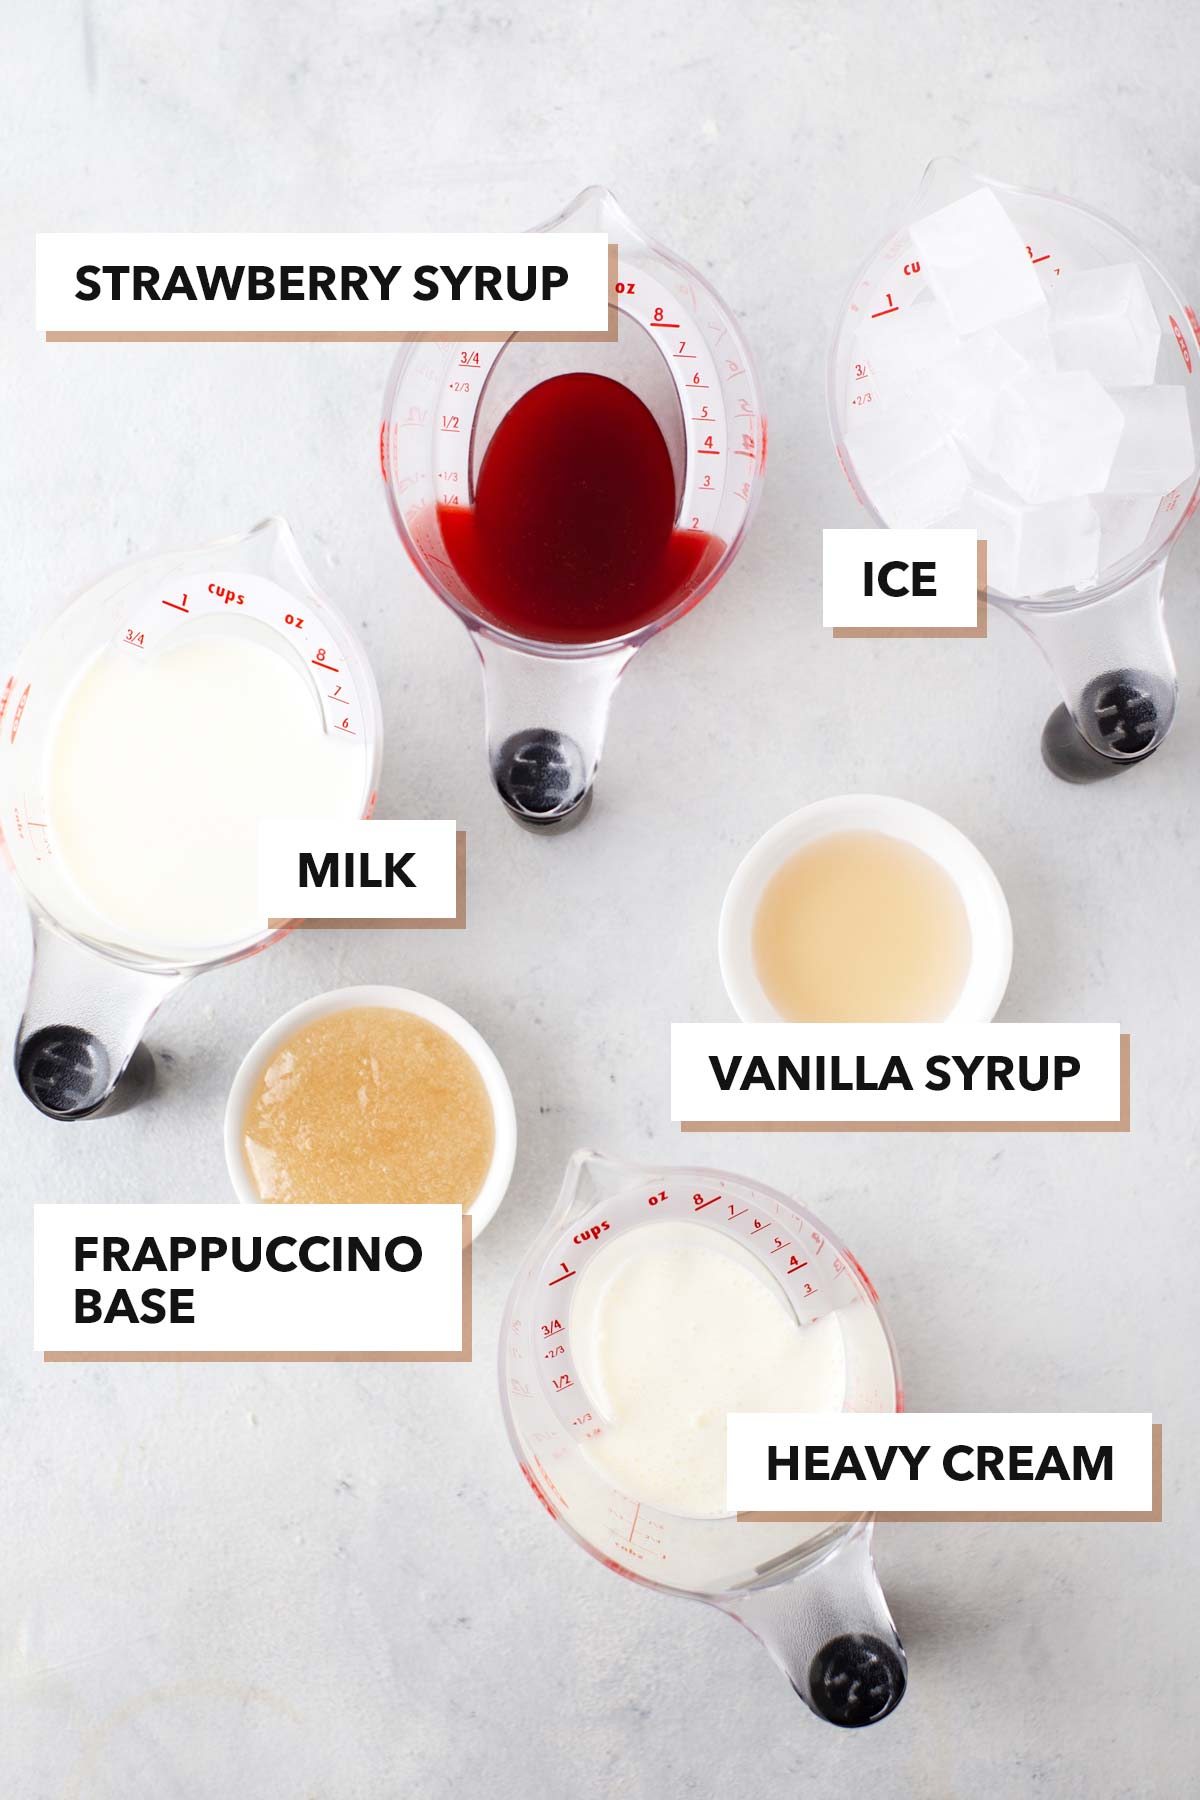 Starbucks Strawberry Frappuccino copycat recipe ingredients.